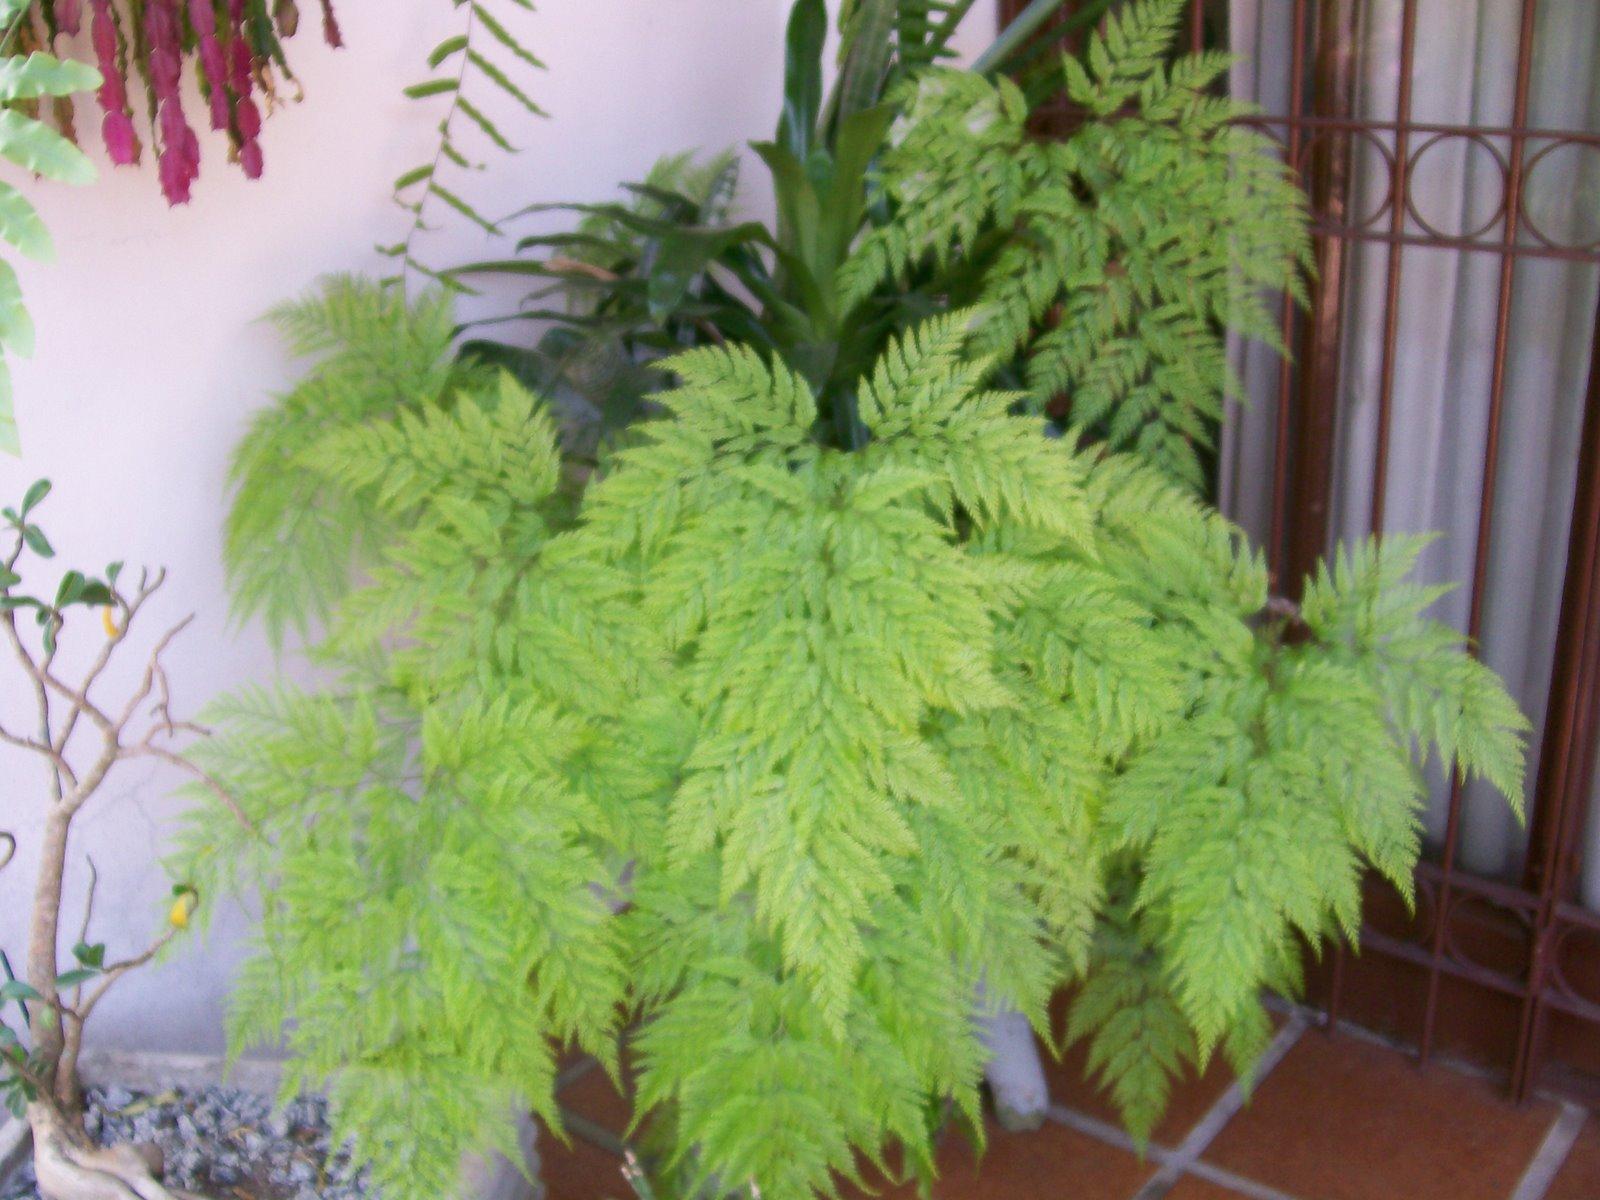 rendaportuguesa  PlantaSonya  O seu blog sobre cultivo de plantas e